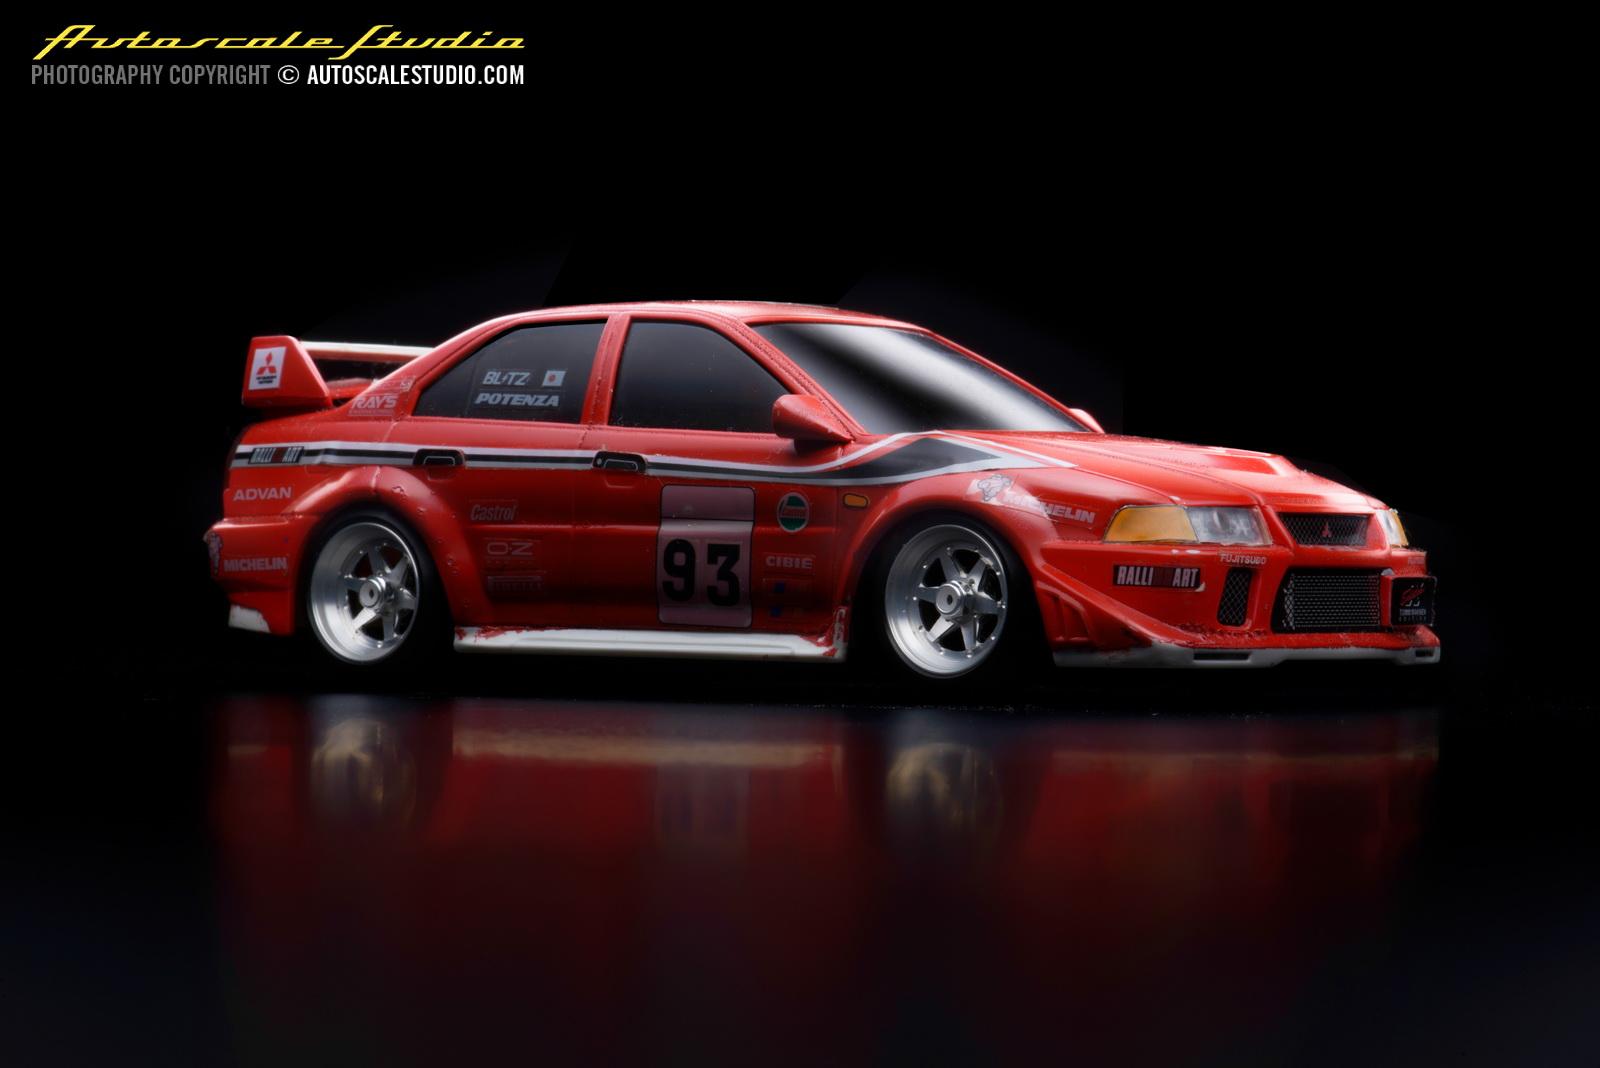 autoscale studio オートスケール・スタジオ: MZB3R Mitsubishi Lancer Evolution VI Tommi MÄKINEN edition red